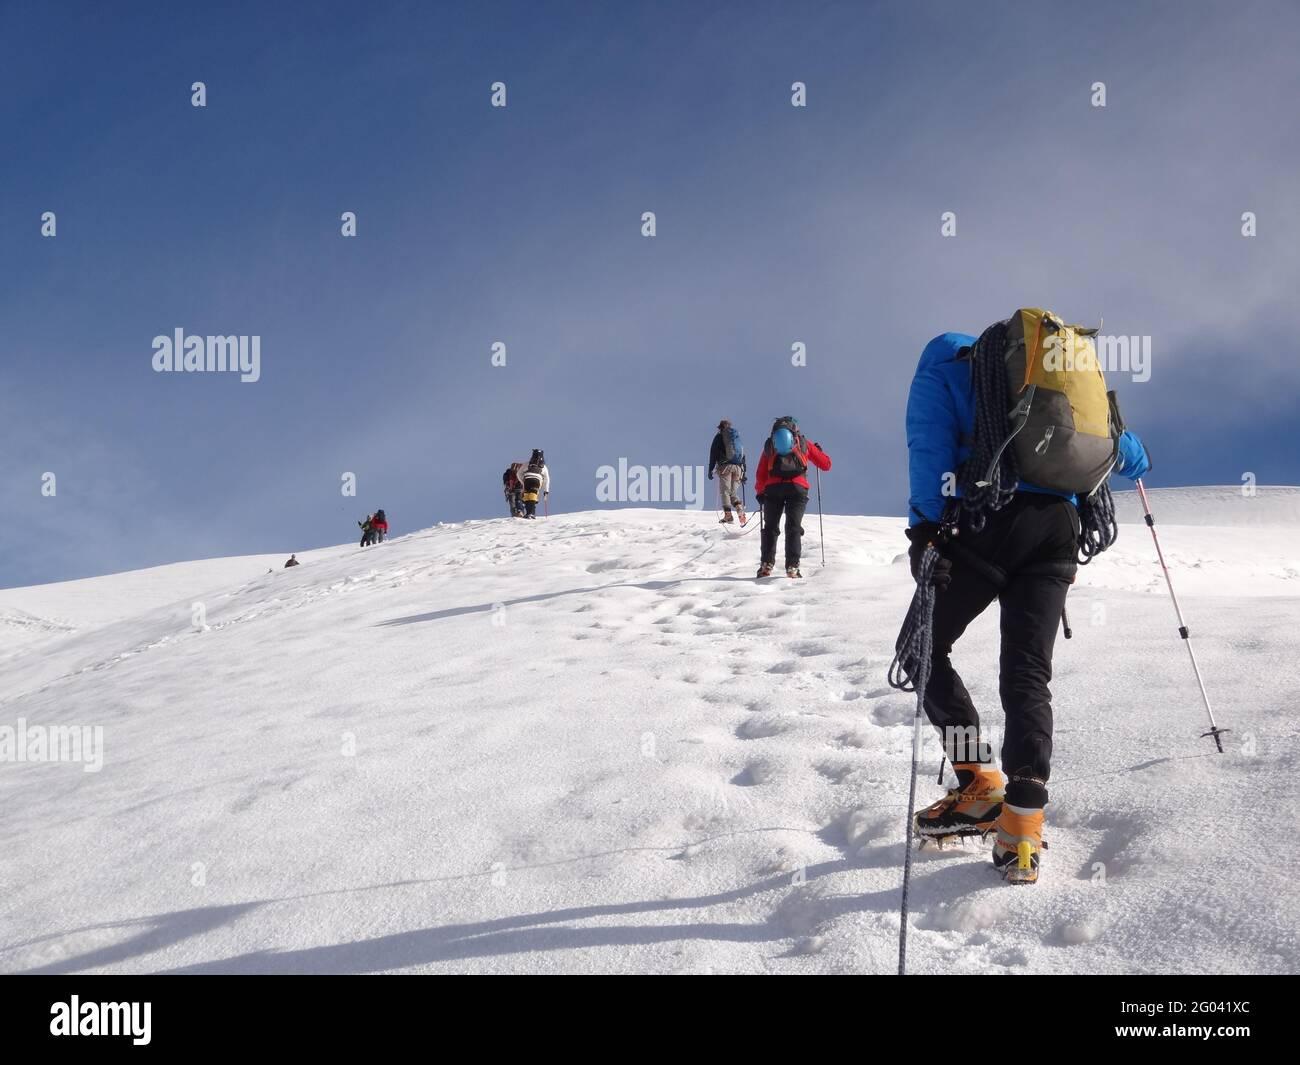 CHAMONIX, FRANCIA - 12 de agosto de 2012: Chamonix-Mont-Blanc / Aiguille du Midi. 3,613 mts Foto de stock